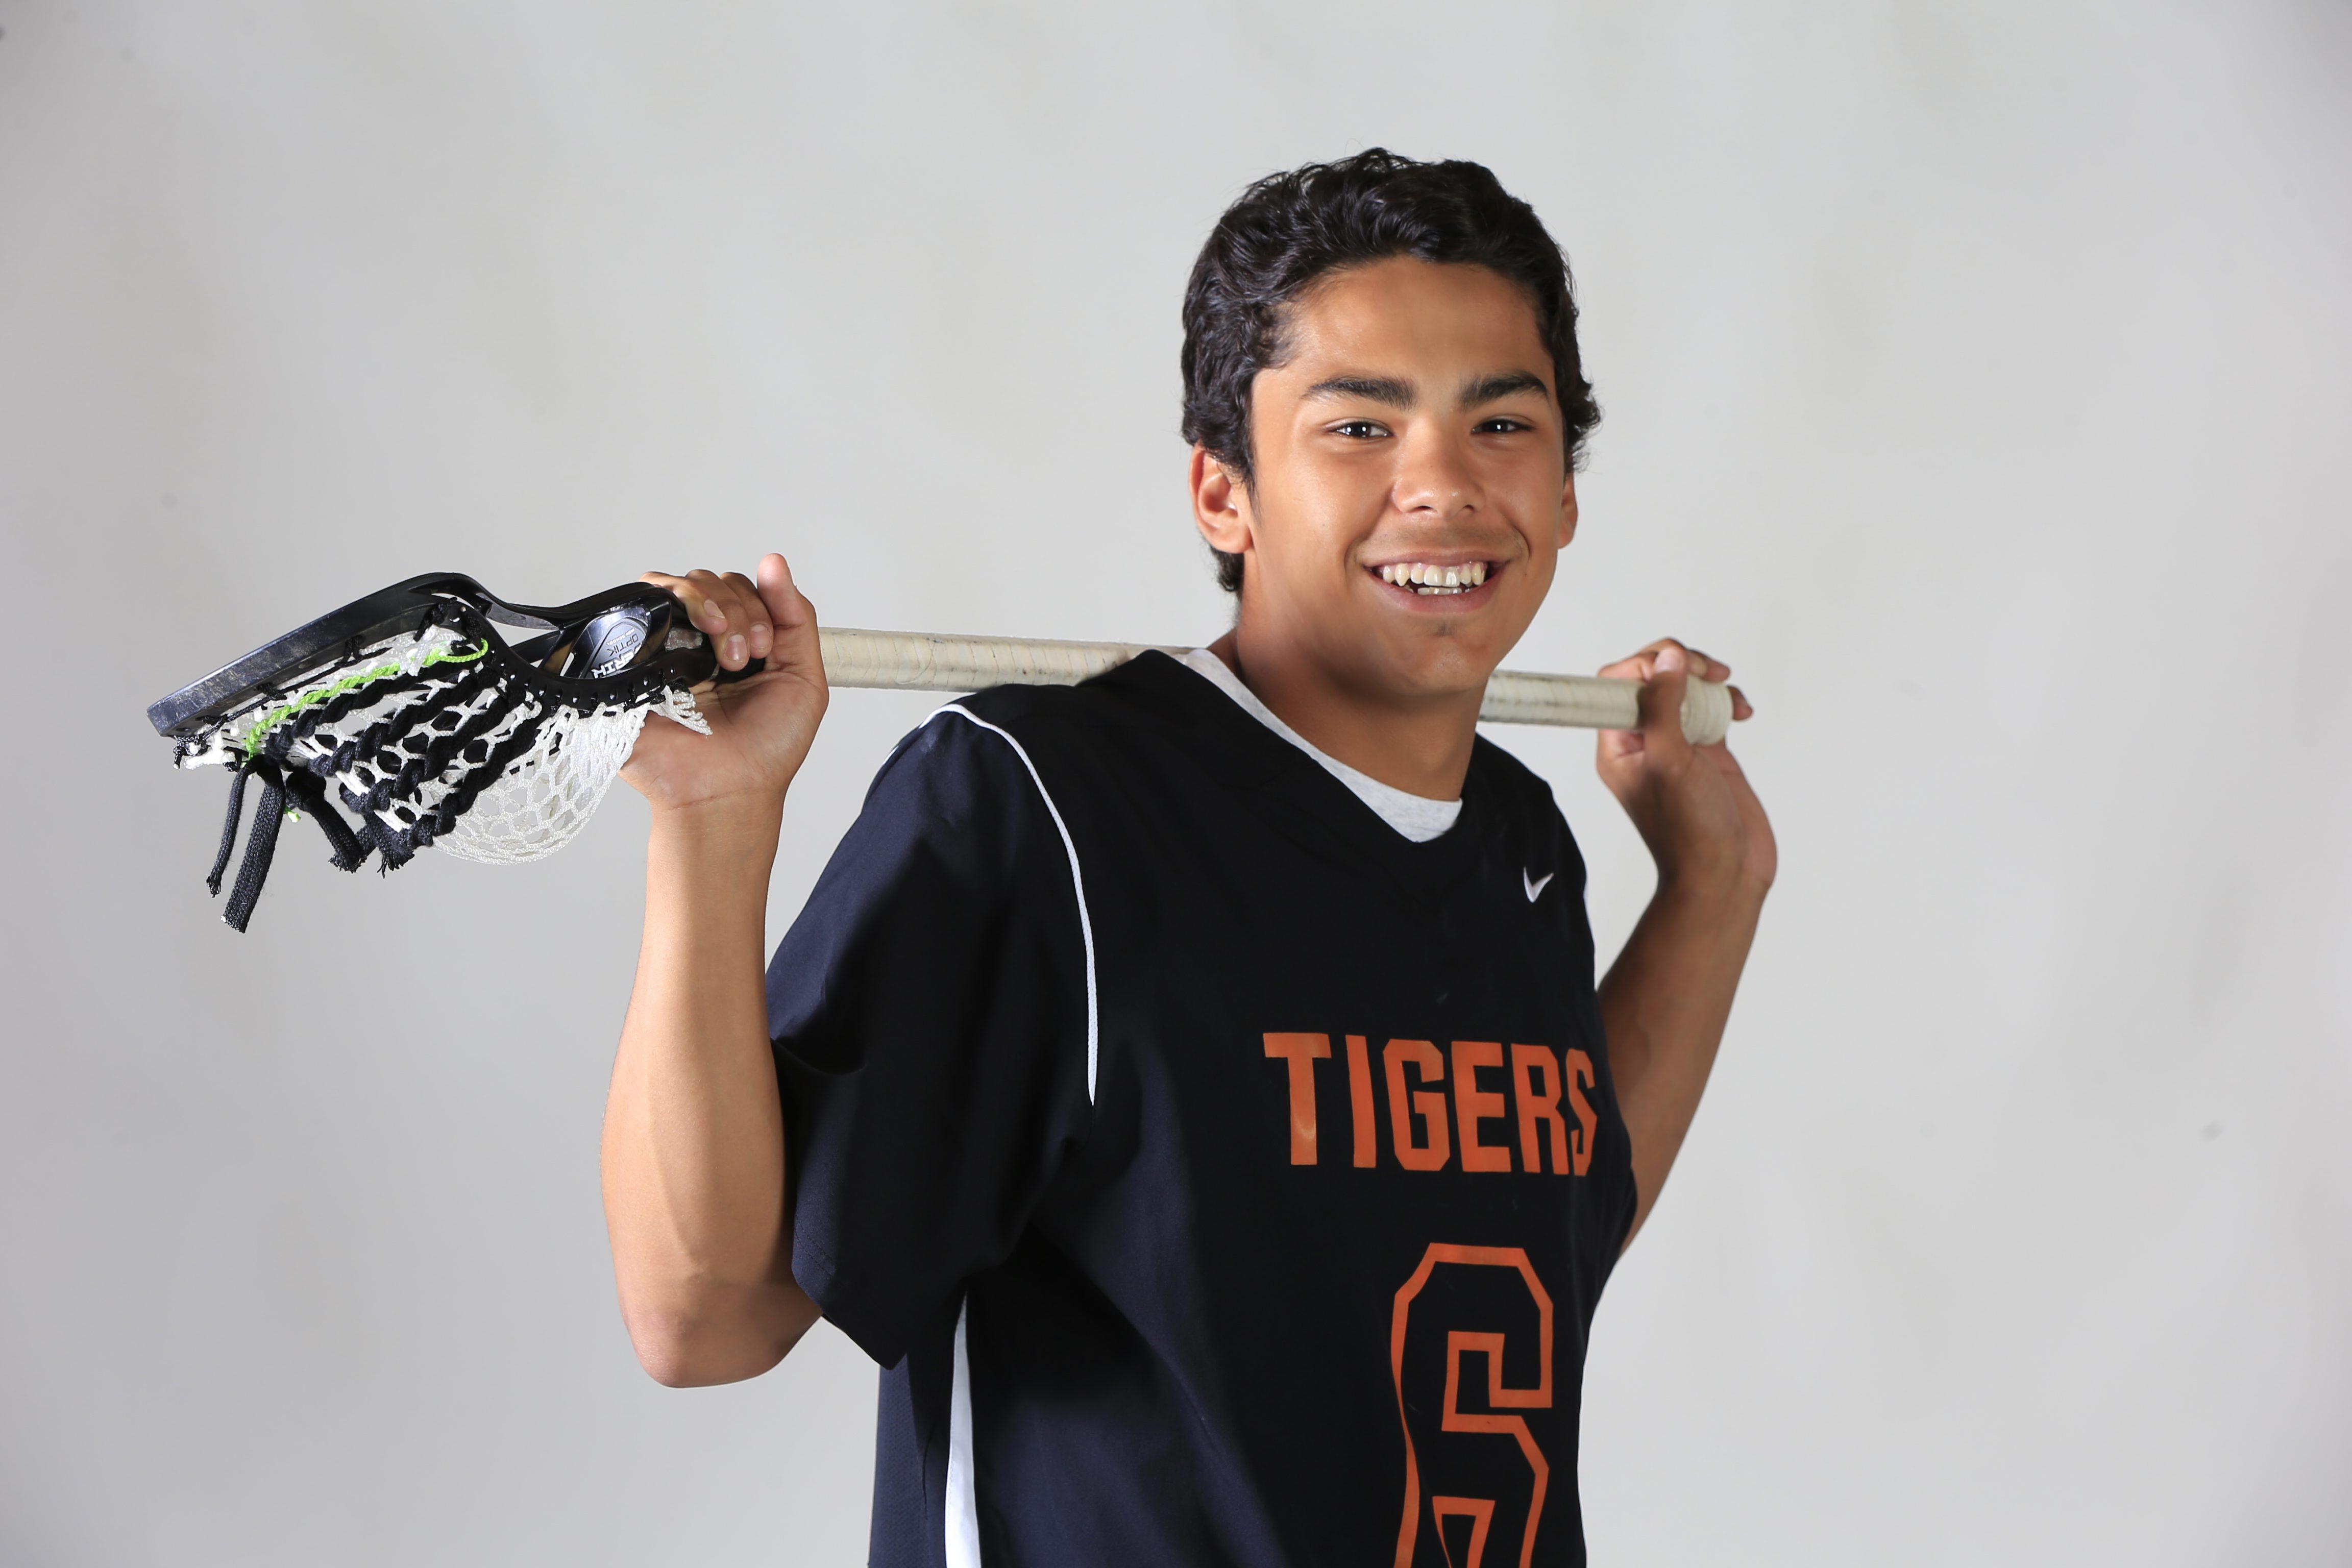 Prep Talk Player of the Year for boys lacrosse: Larson Sundown of Akron. (Harry Scull Jr./Buffalo News)